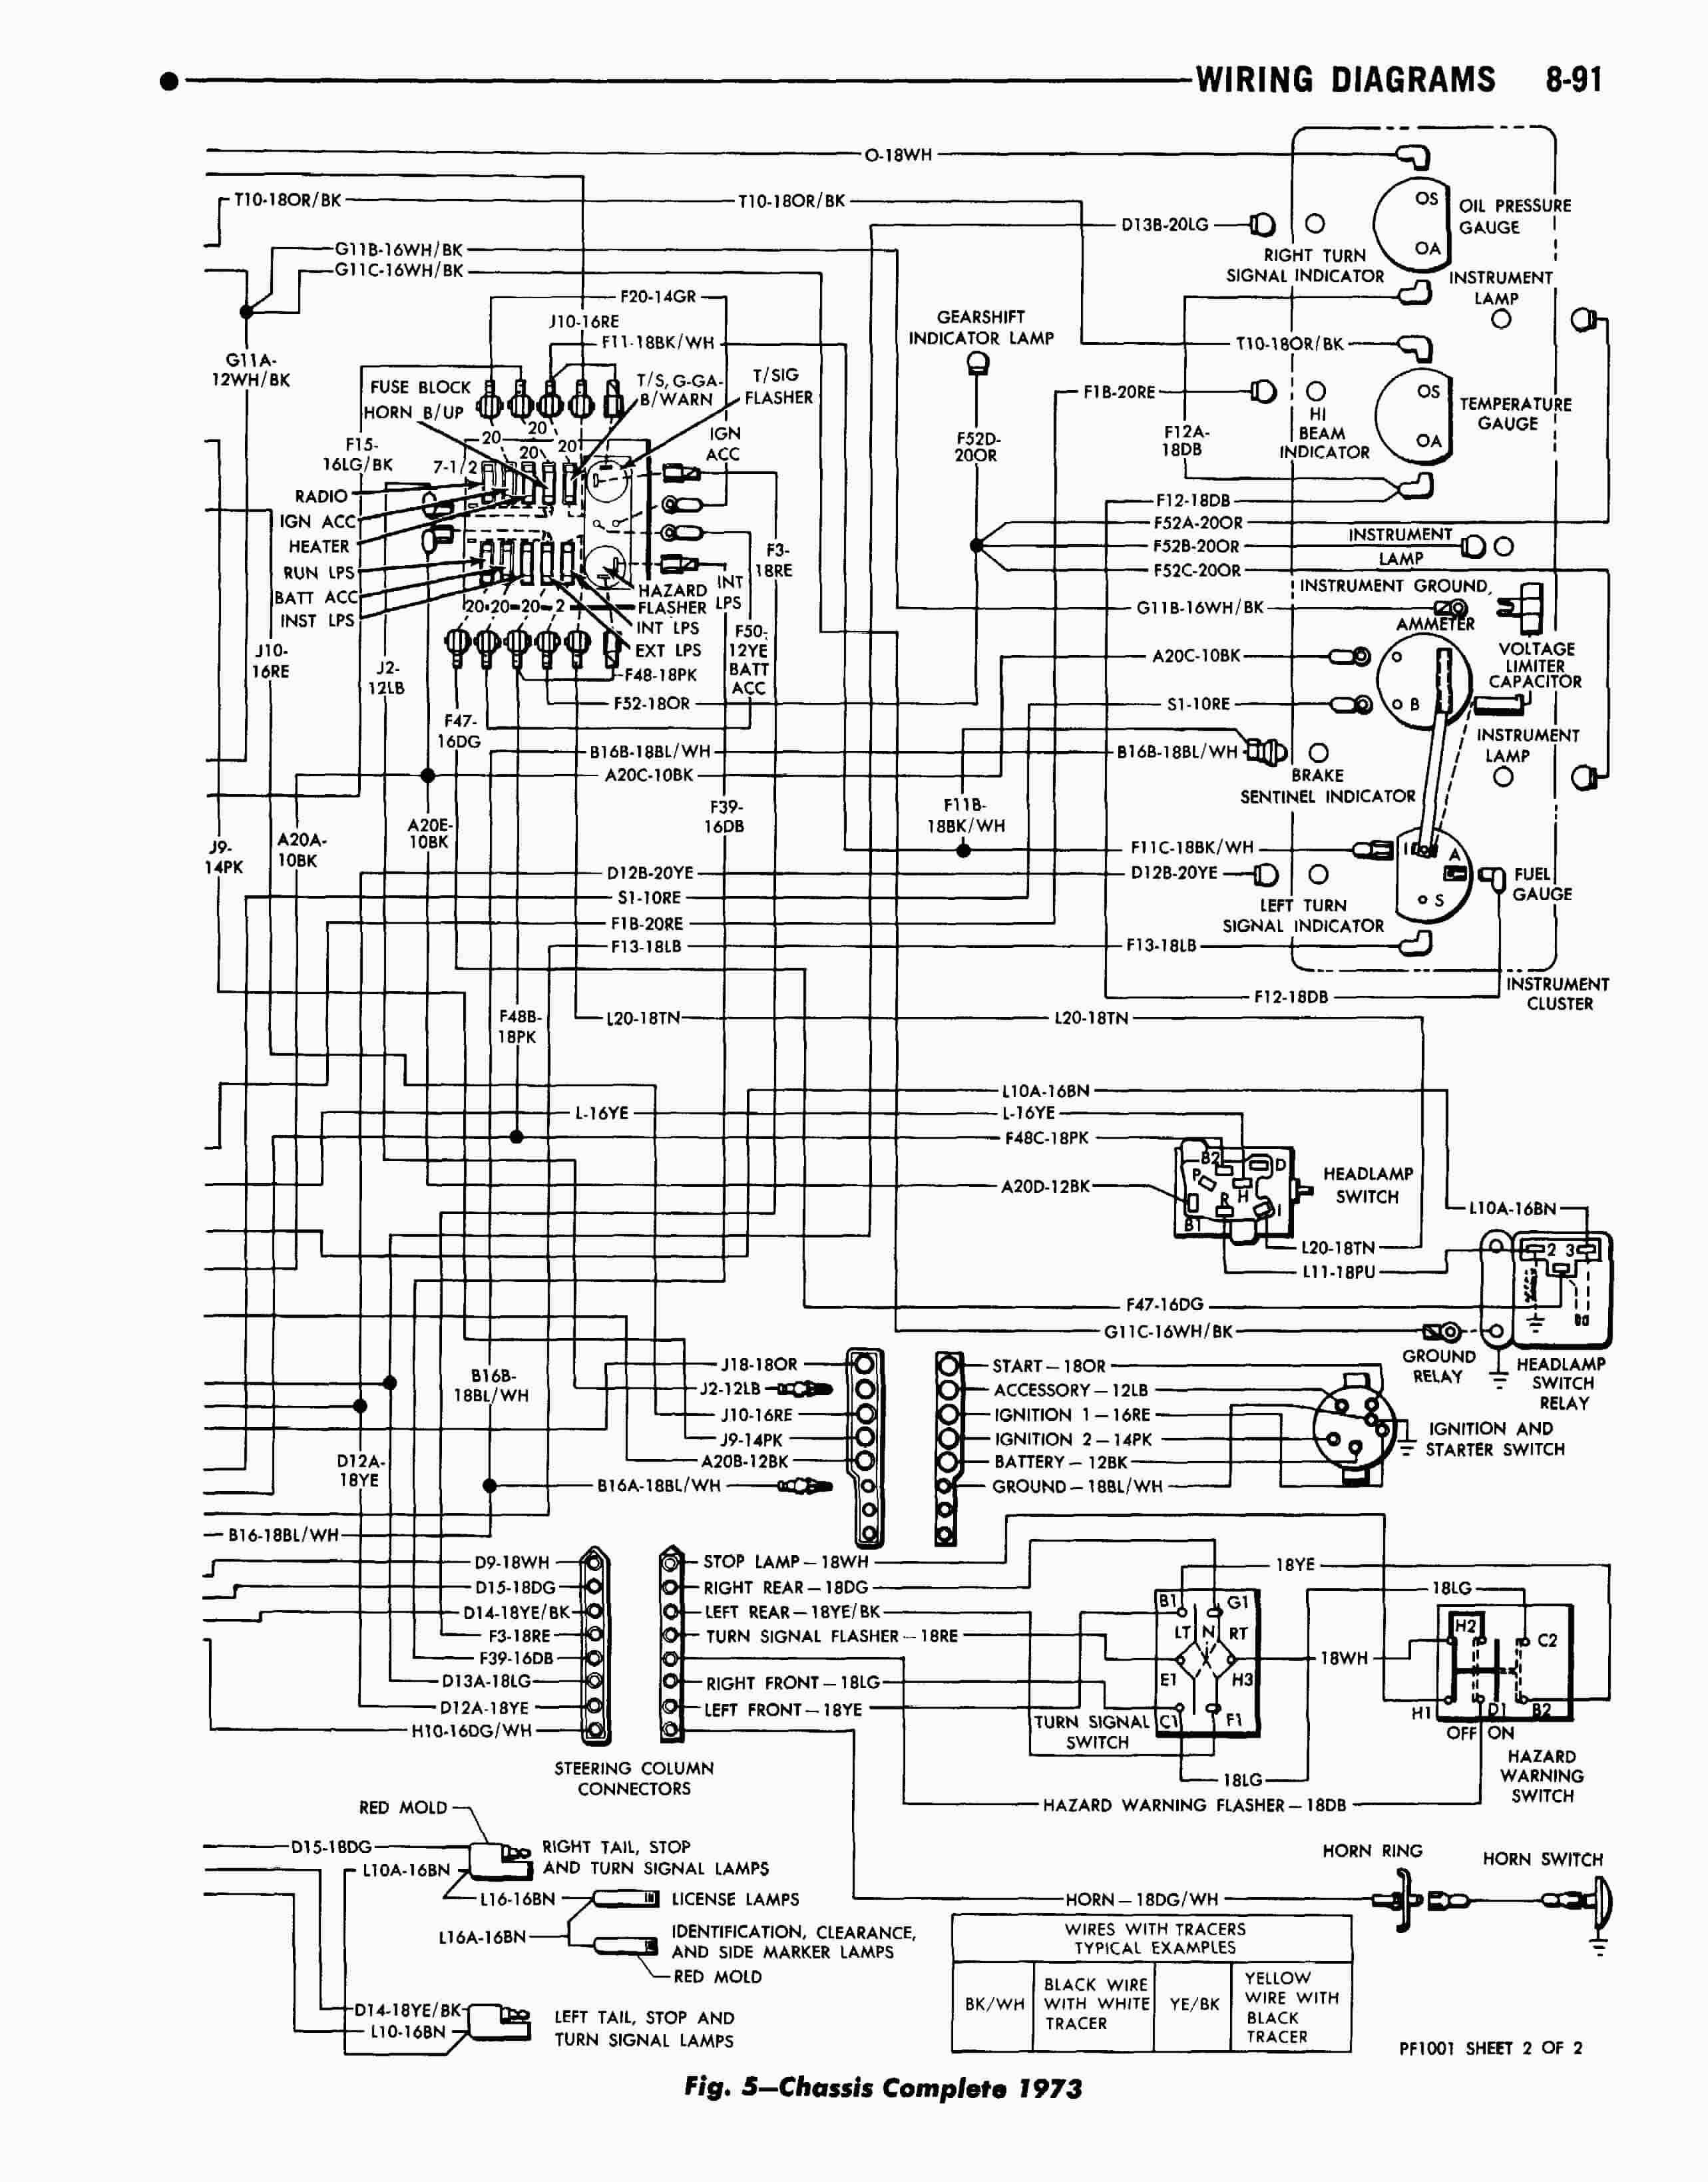 Car Chassis Diagram Fleetwood Rv Diagrams Experts Wiring Diagram • Of Car Chassis Diagram